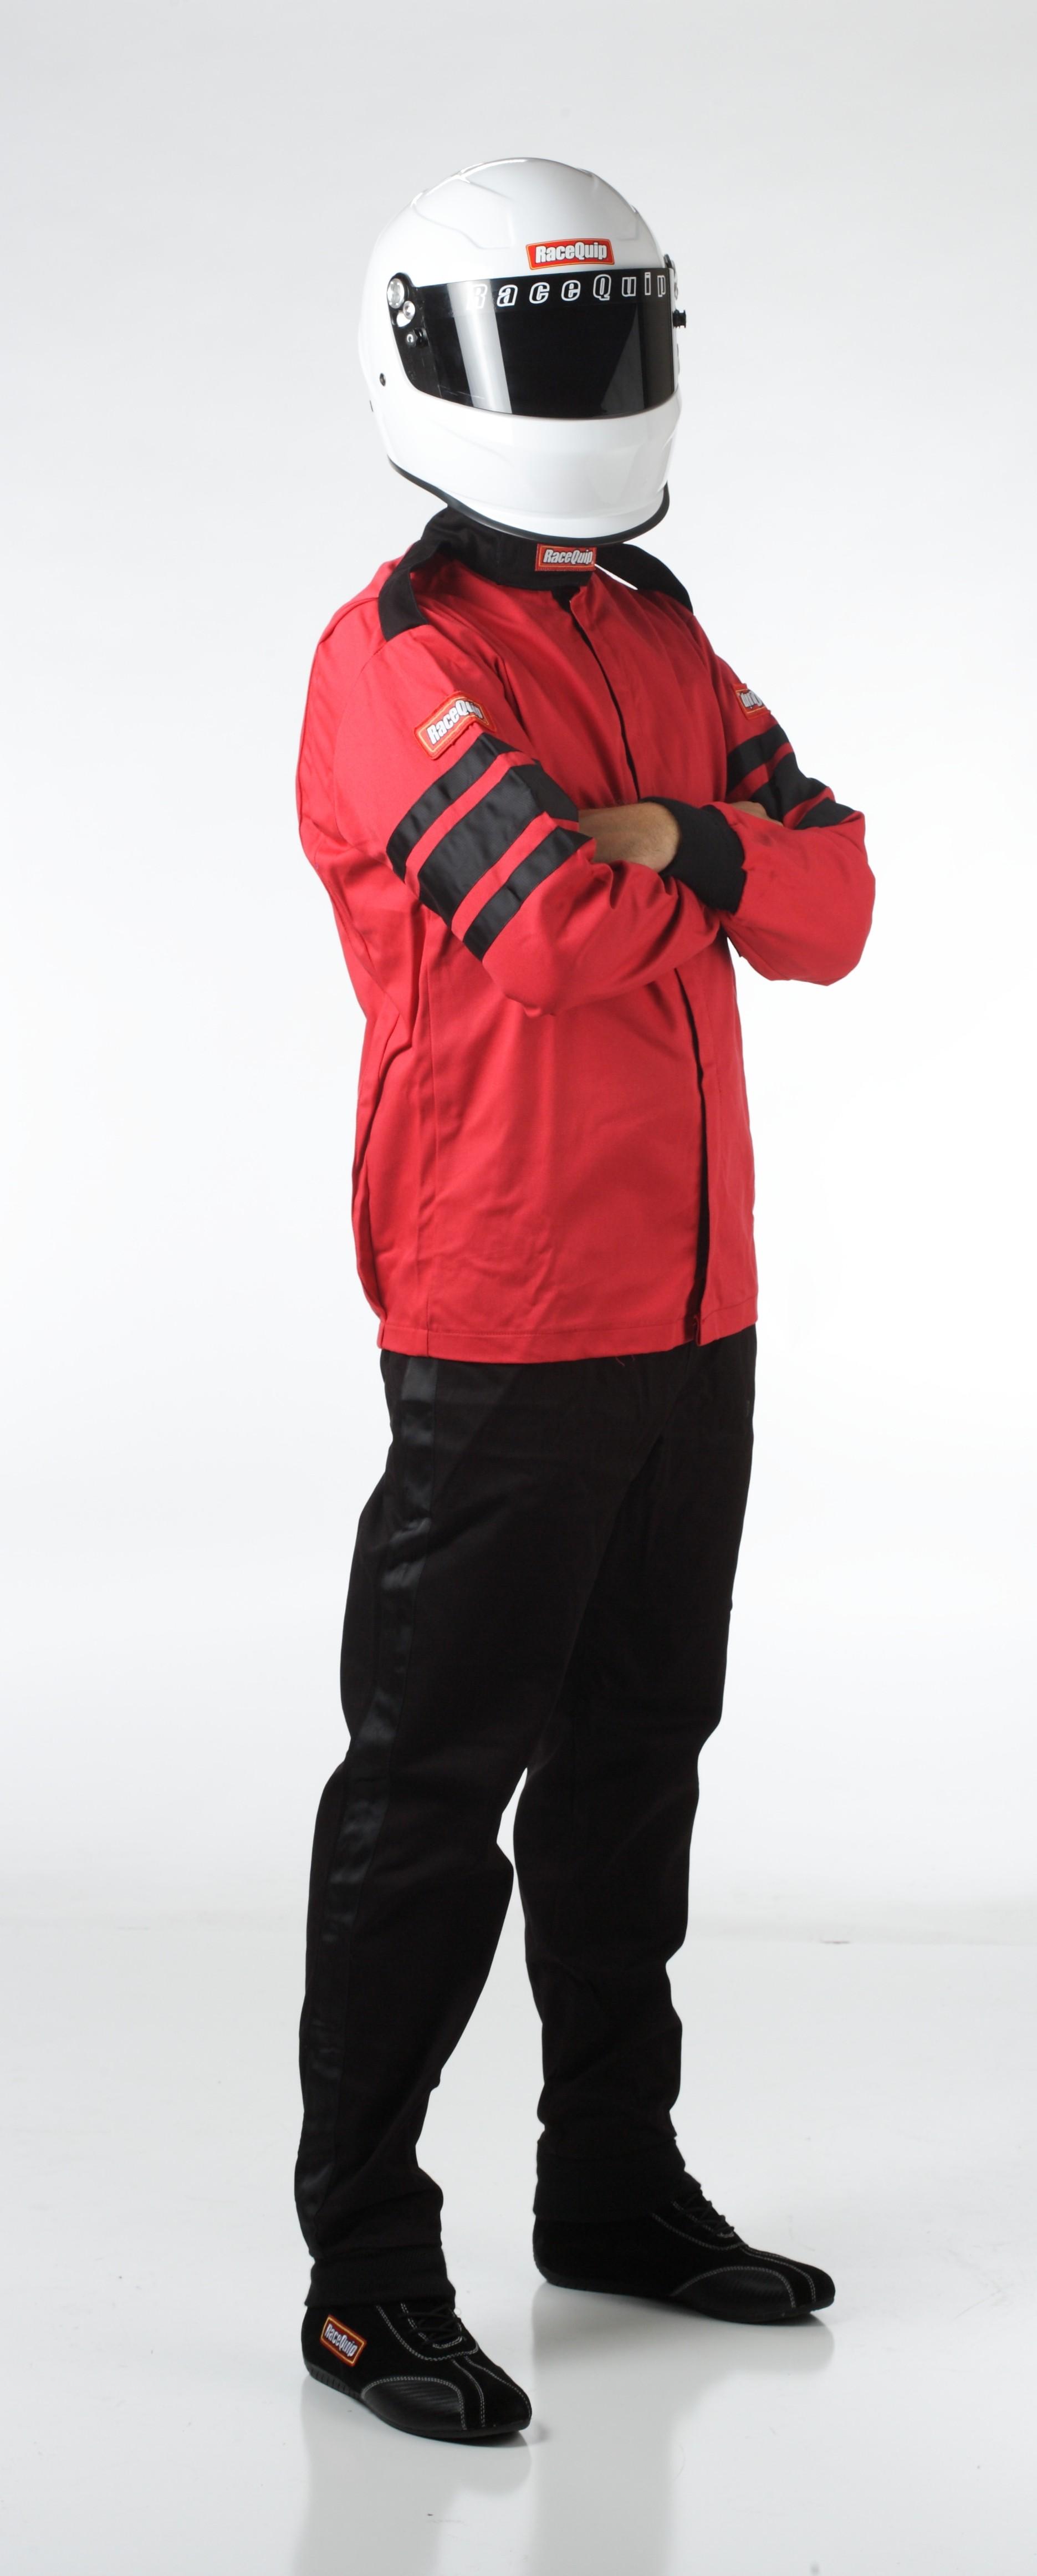 Racequip 111015 SFI-1 Single Layer Driving Jacket Red Large